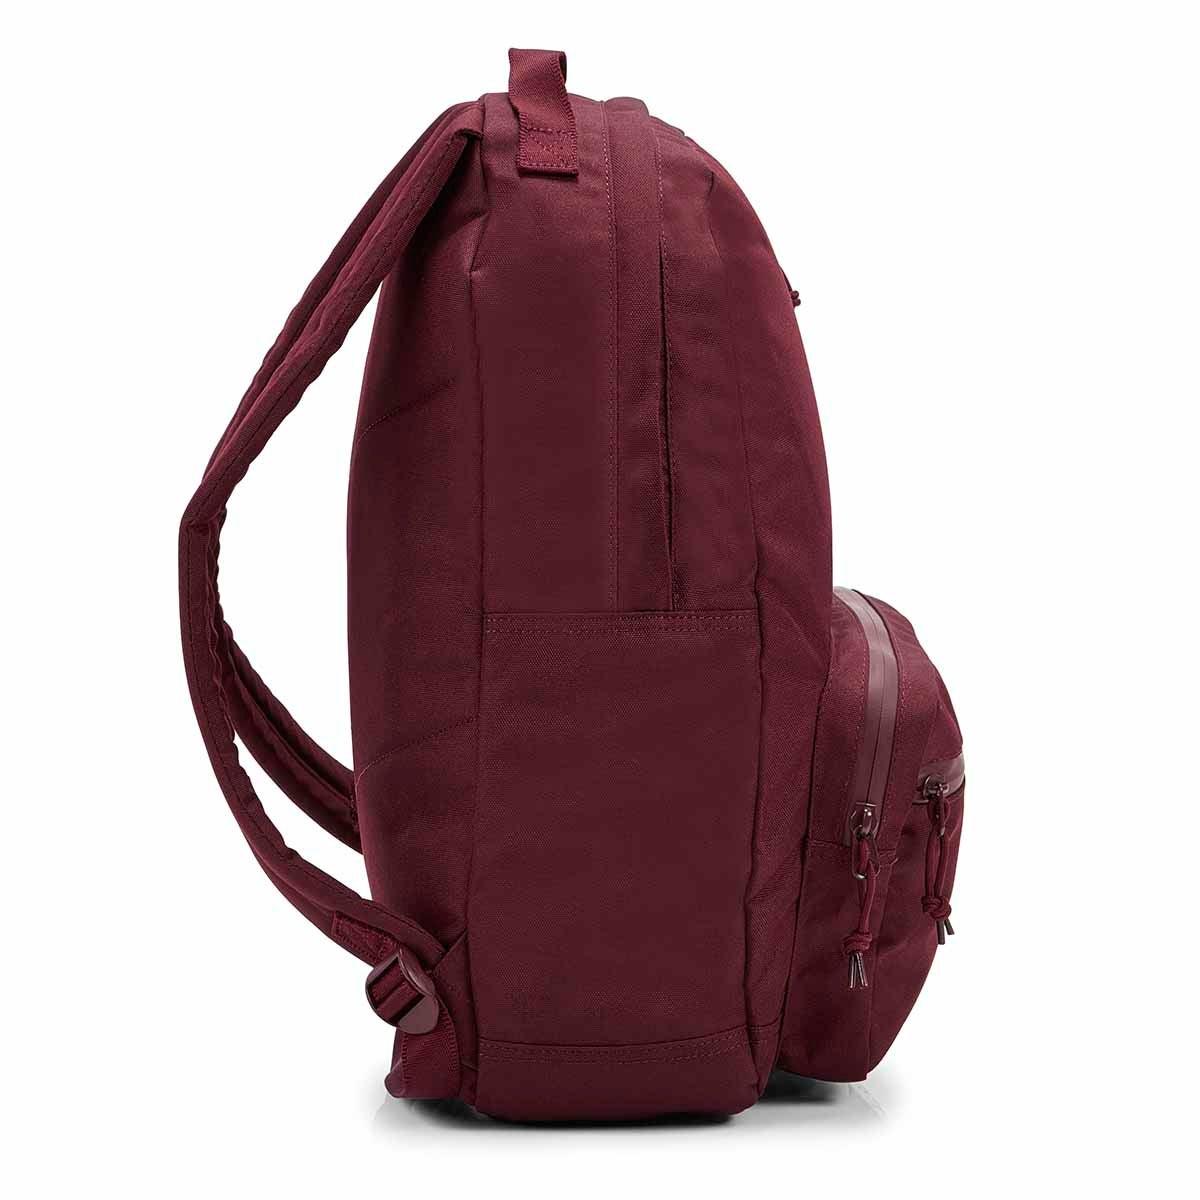 Unisex The GO dark sangria backpack